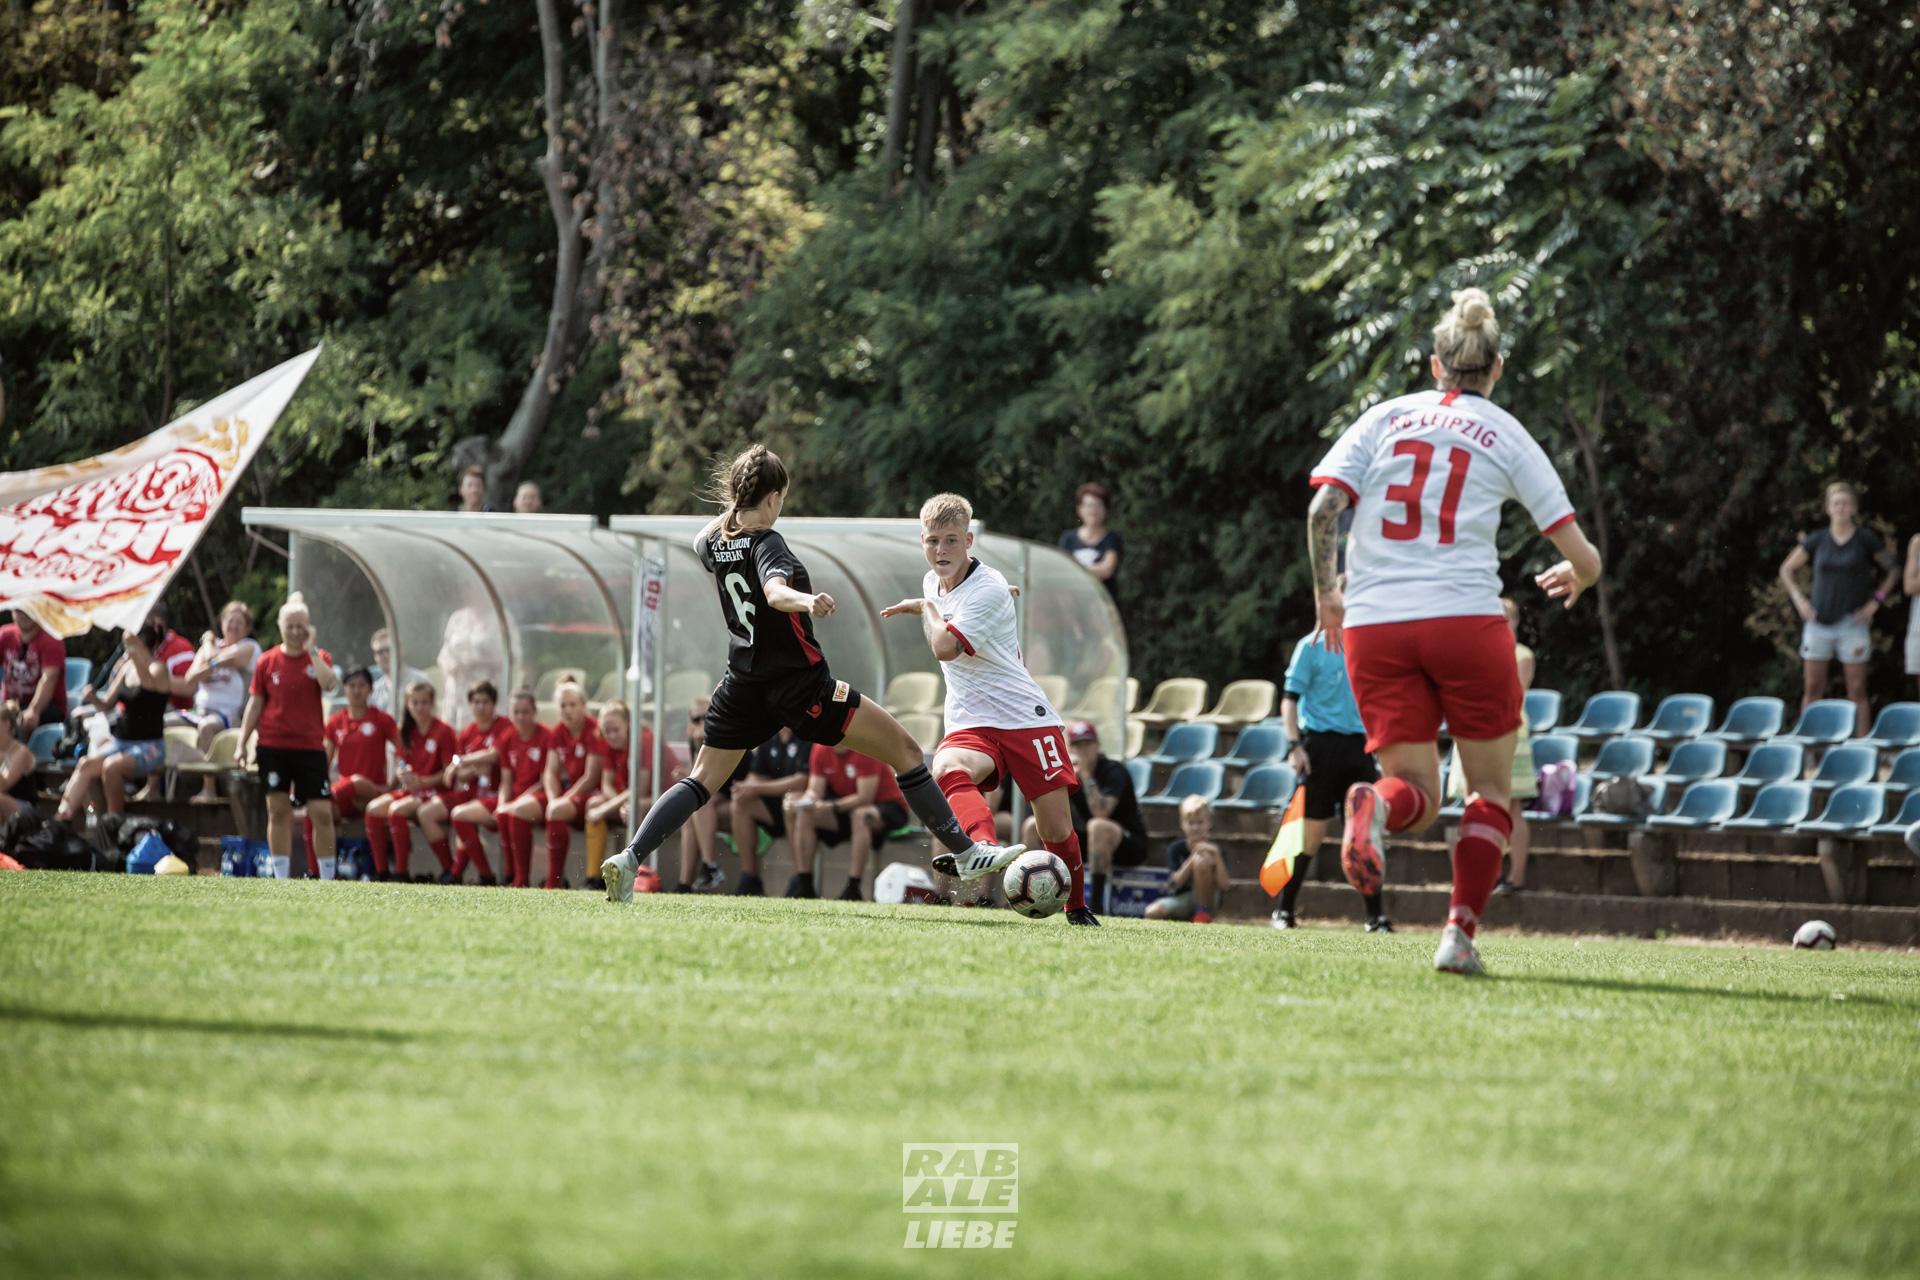 Regionalliga Nordost Frauen: RB Leipzig -vs- 1. FC Union Berlin